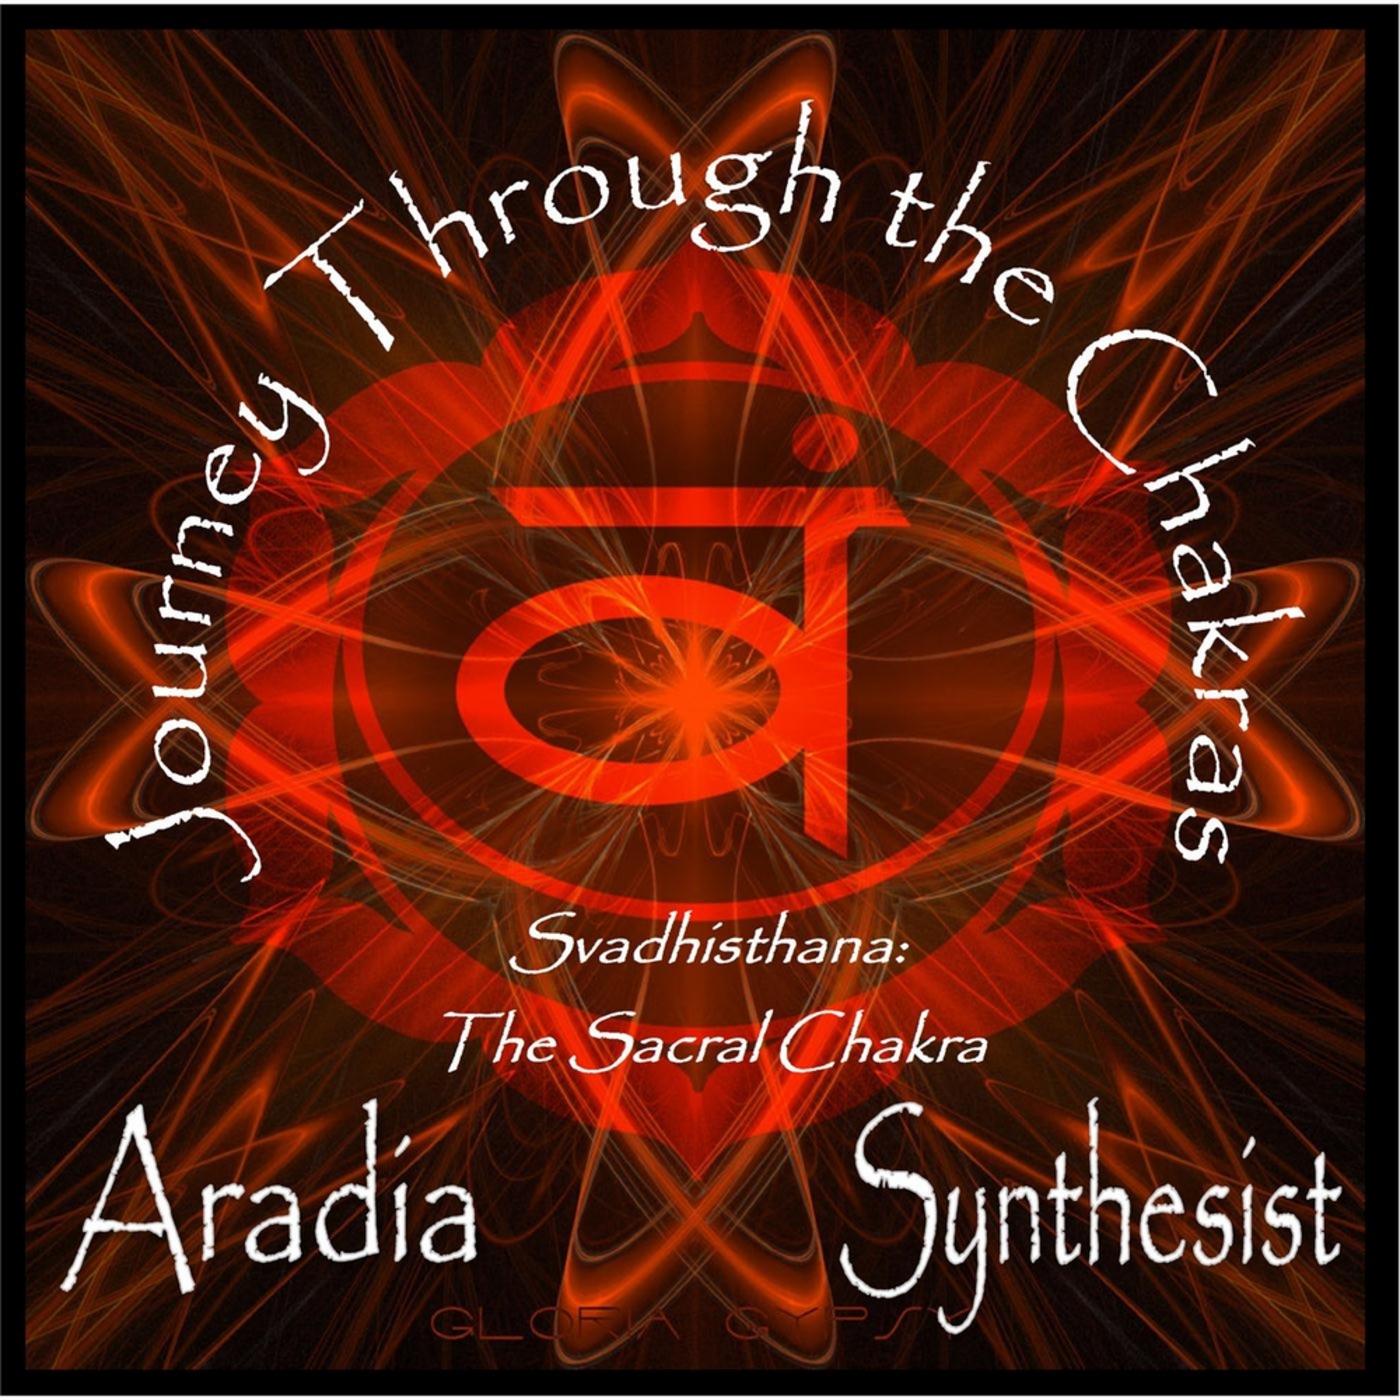 Journey Through the Chakras: Svadhisthana (The Sacral Chakra)